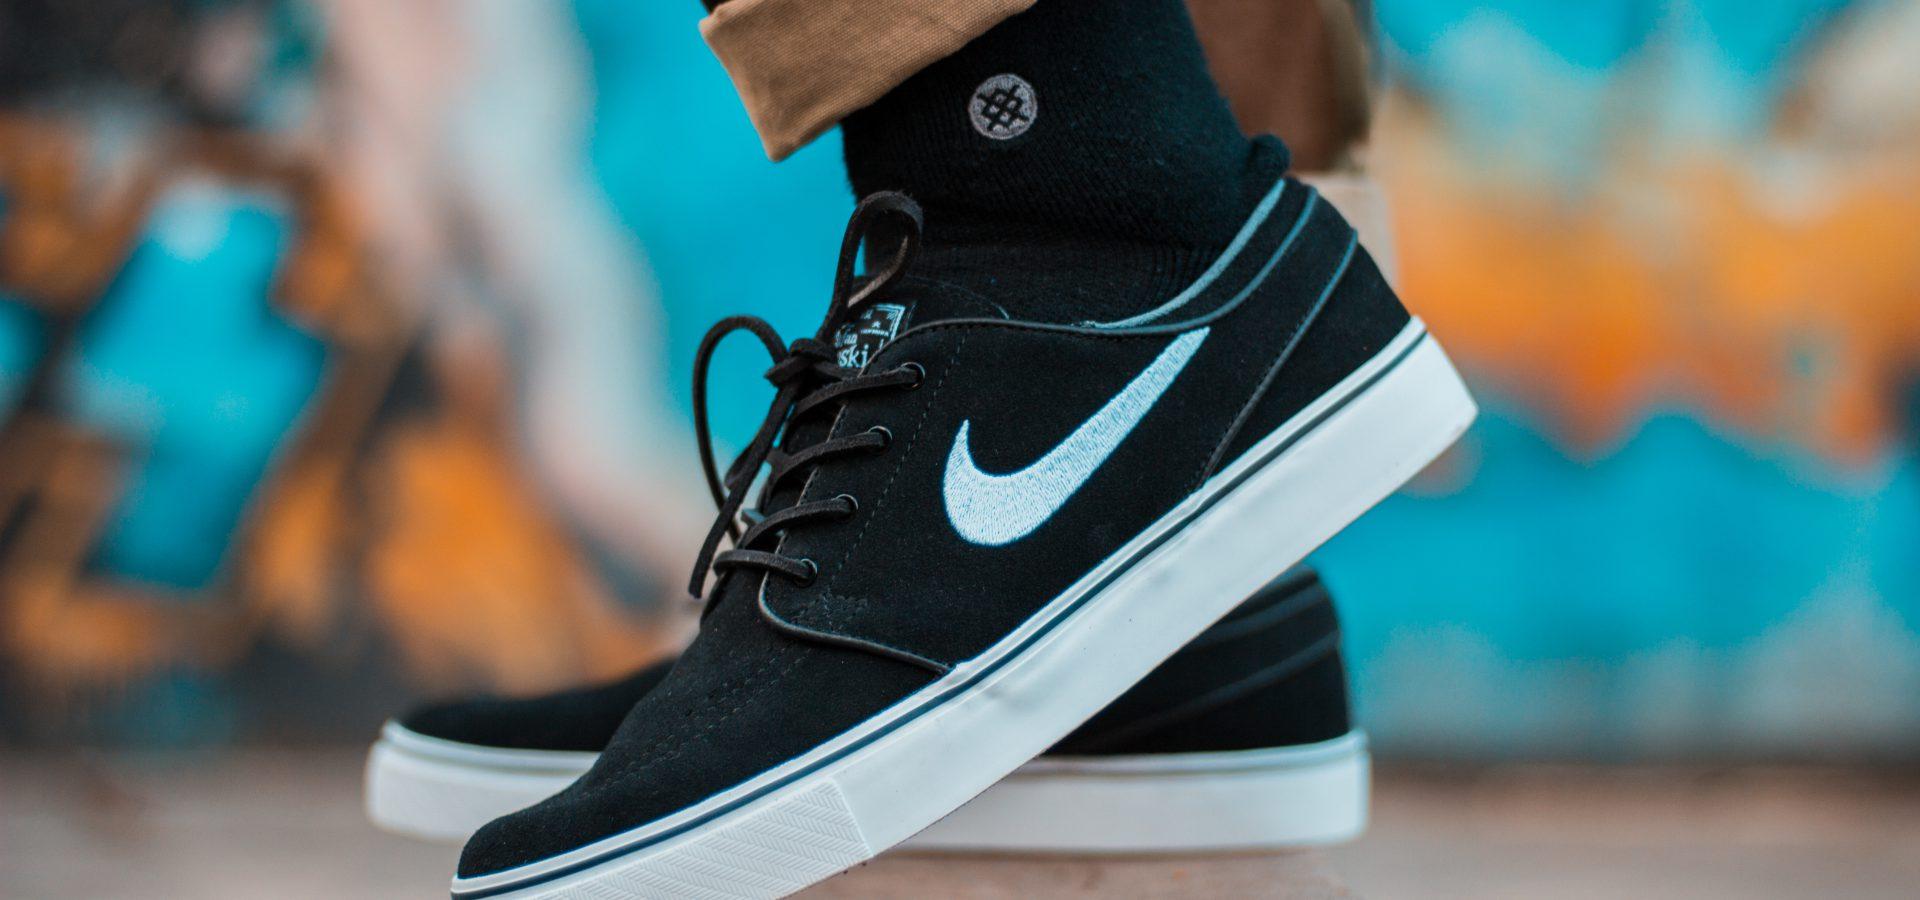 Nike Black Friday 2020 Sale: Get Amazing Deals And Cash Back